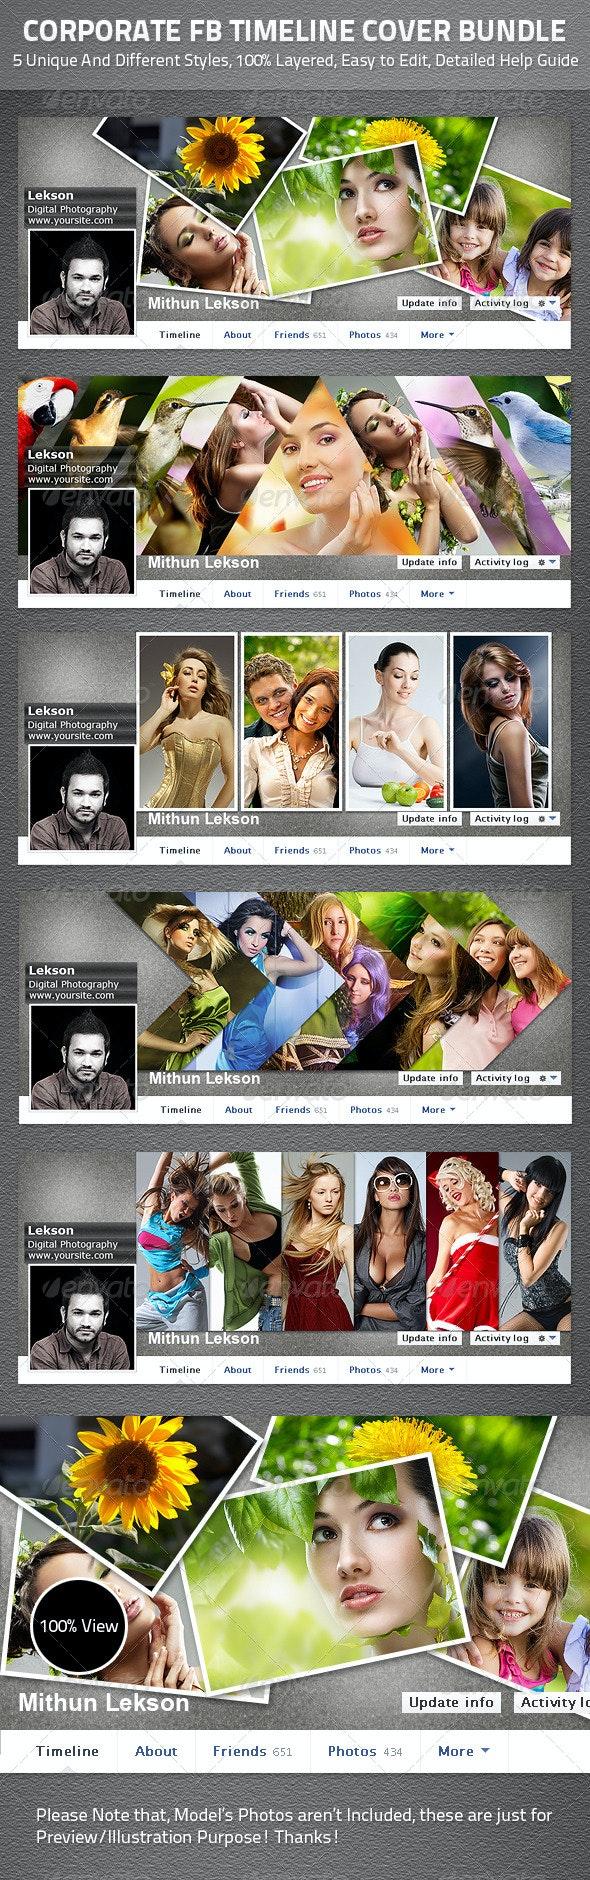 Corporate Facebook Timeline Cover Bundle - Facebook Timeline Covers Social Media